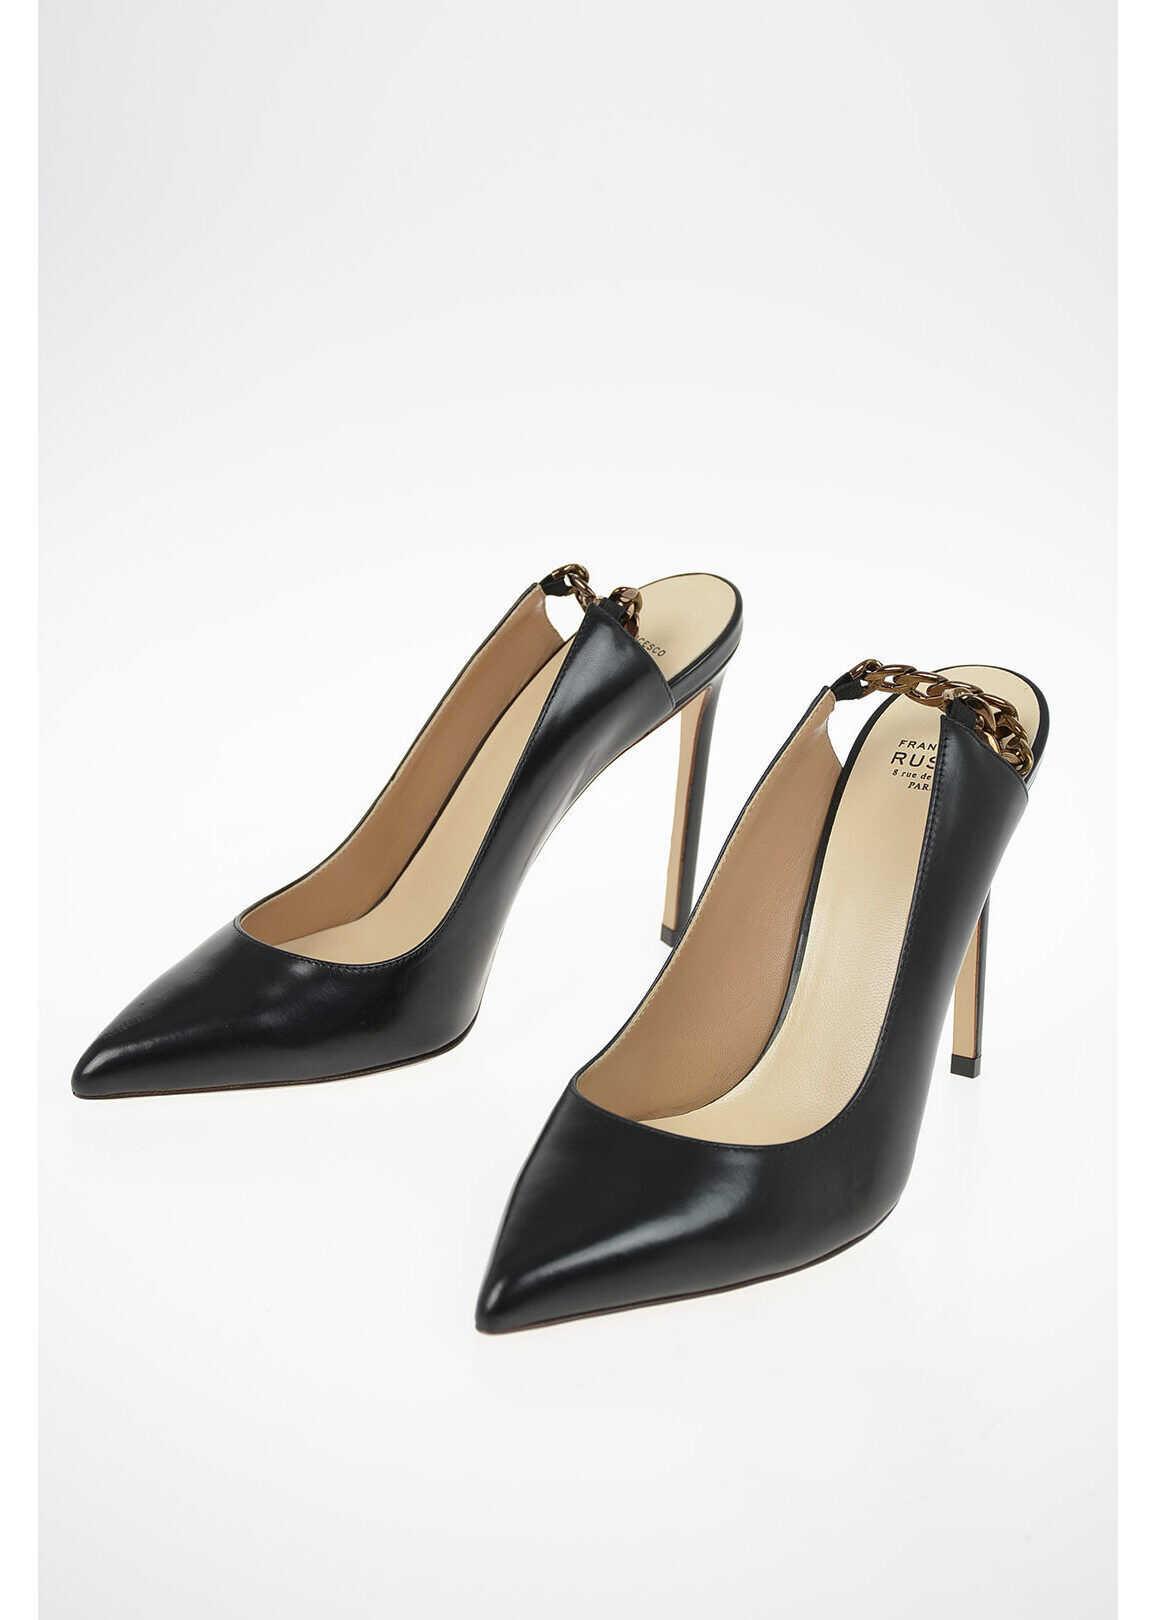 Francesco Russo Leather Slingbacks 10cm BLACK imagine b-mall.ro